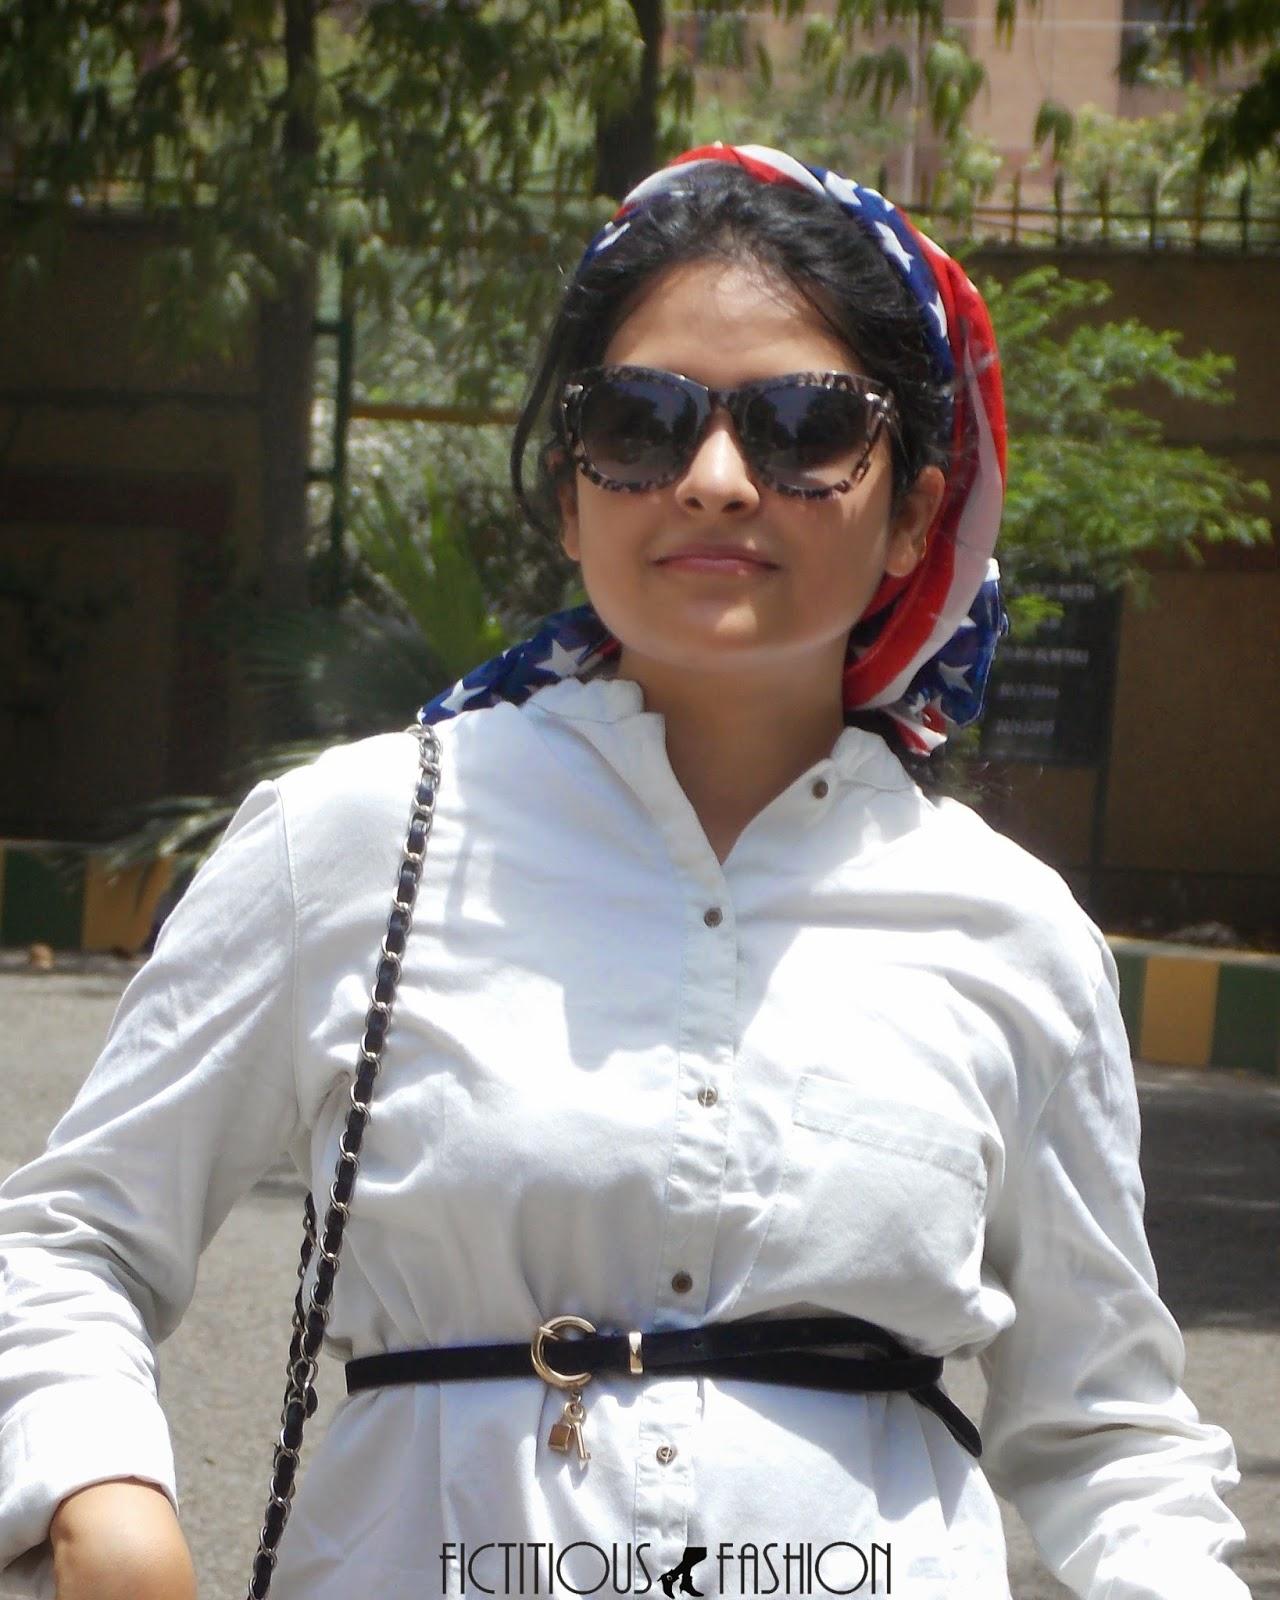 Fictitious Fashion: Being Americano: Denim shirt & Bandana